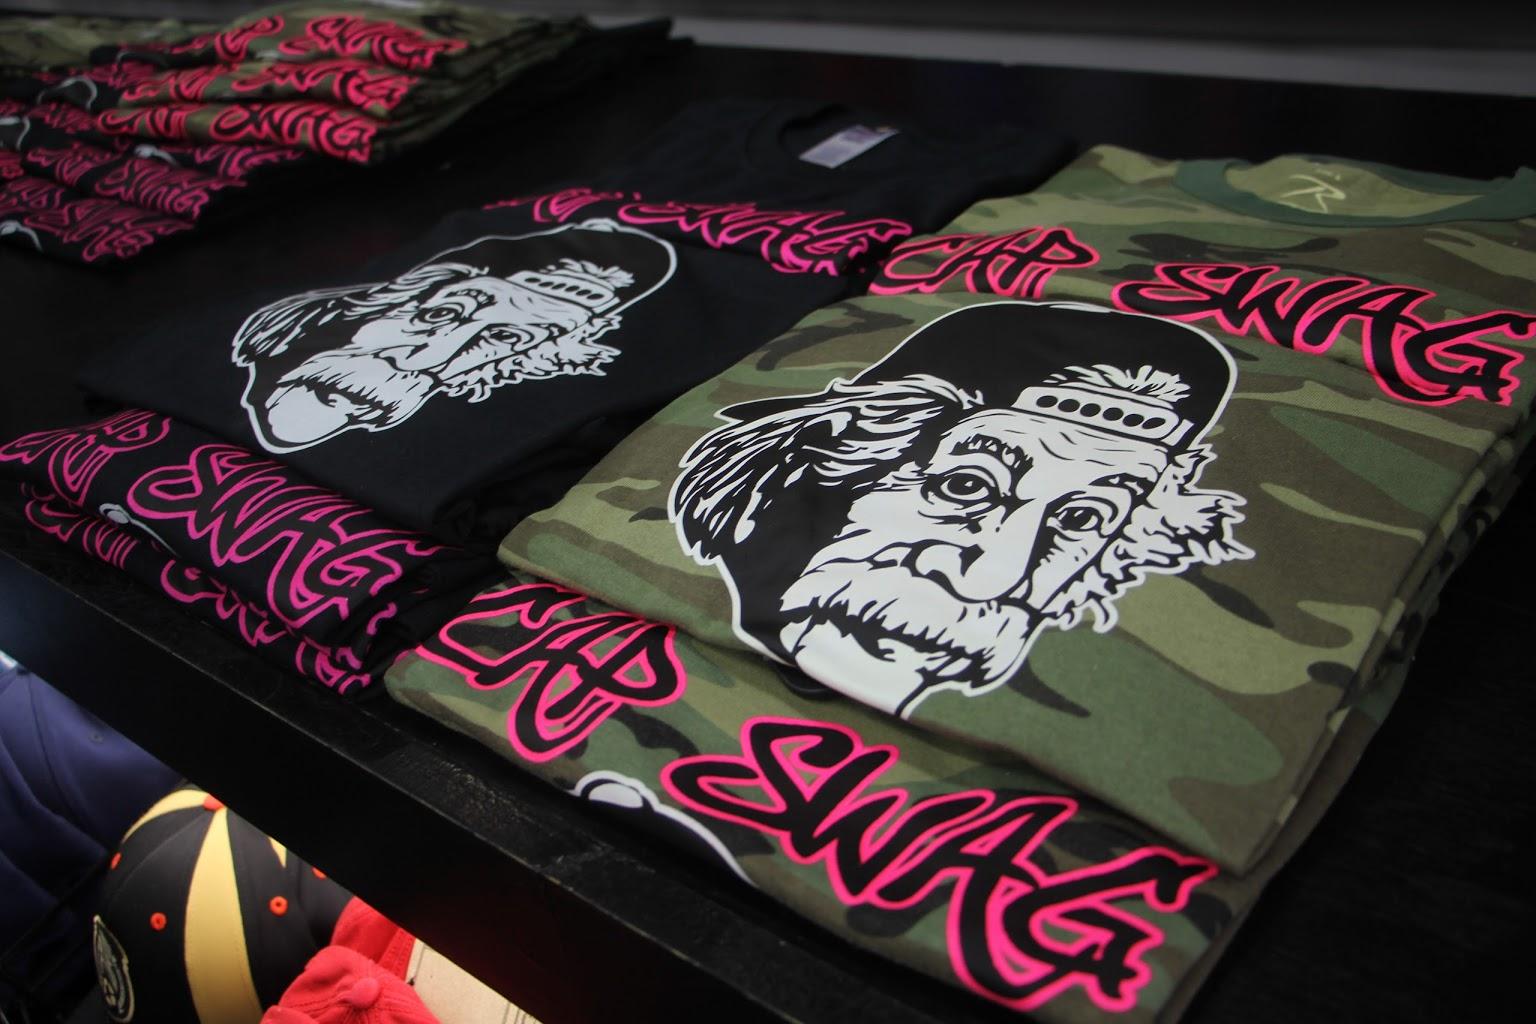 einstein tee shirts at Cap Swag snap back hats Wildwood, NJ